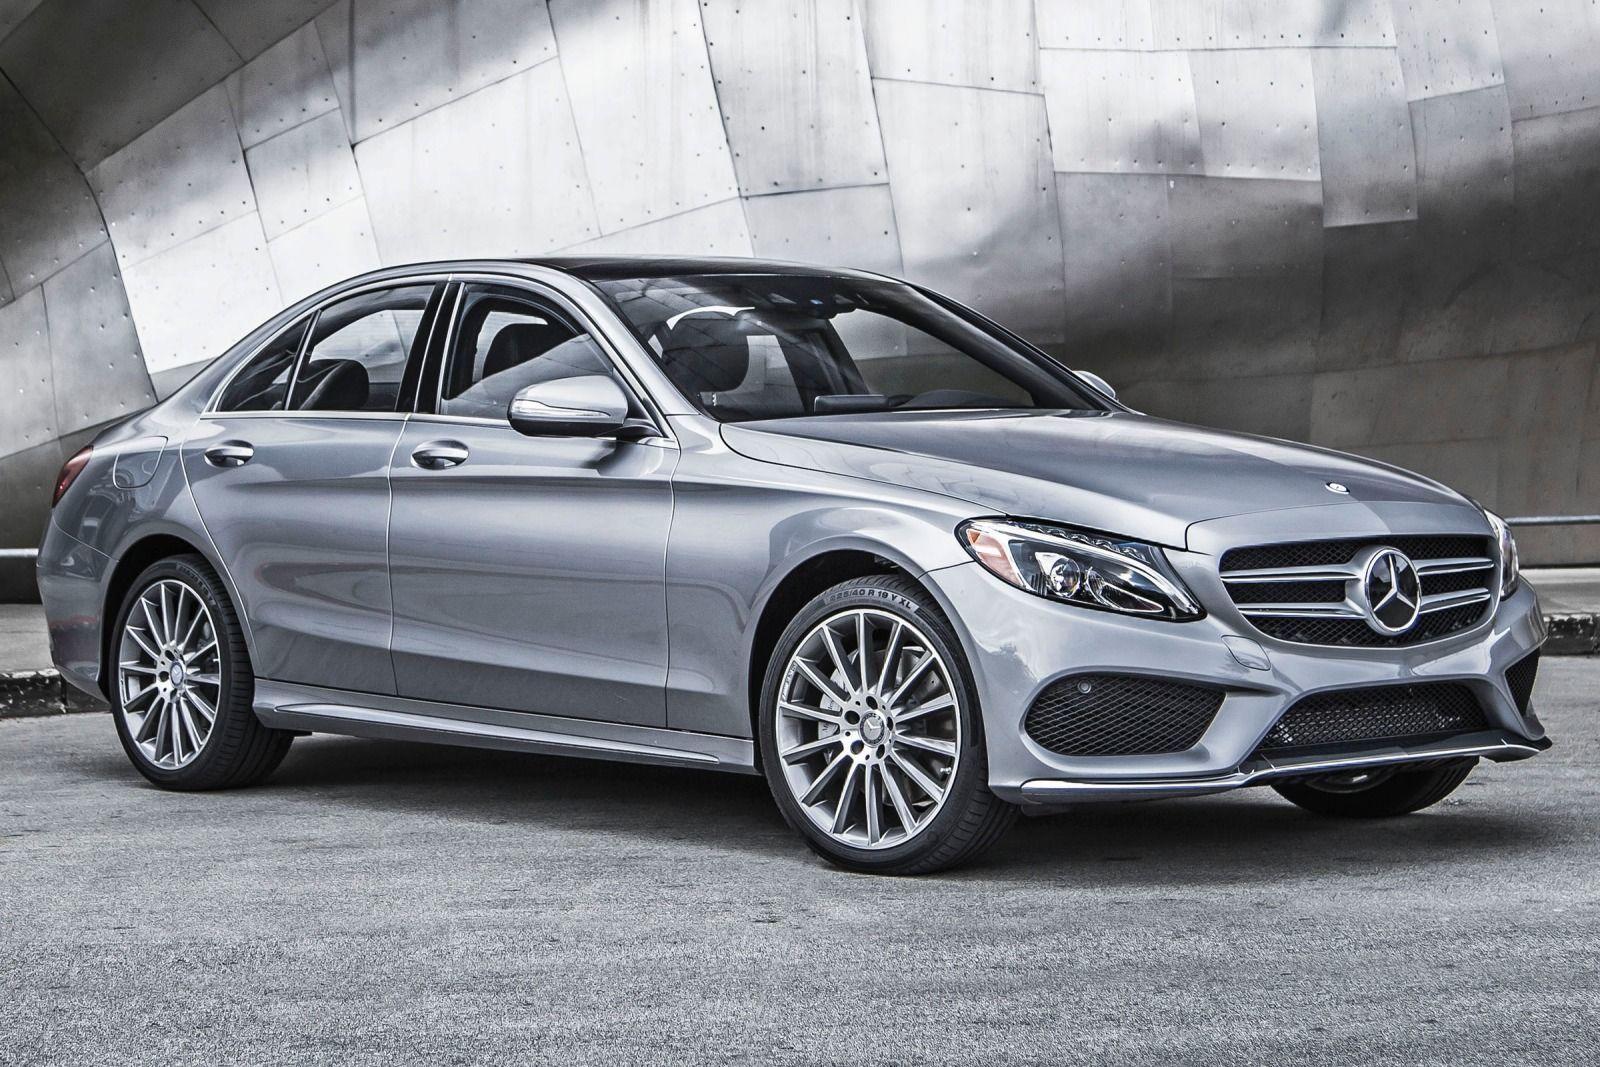 C300 Mercedes 2015 Price >> The Made In Alabama 2015 Mercedes Benz C Class C300 Luxury